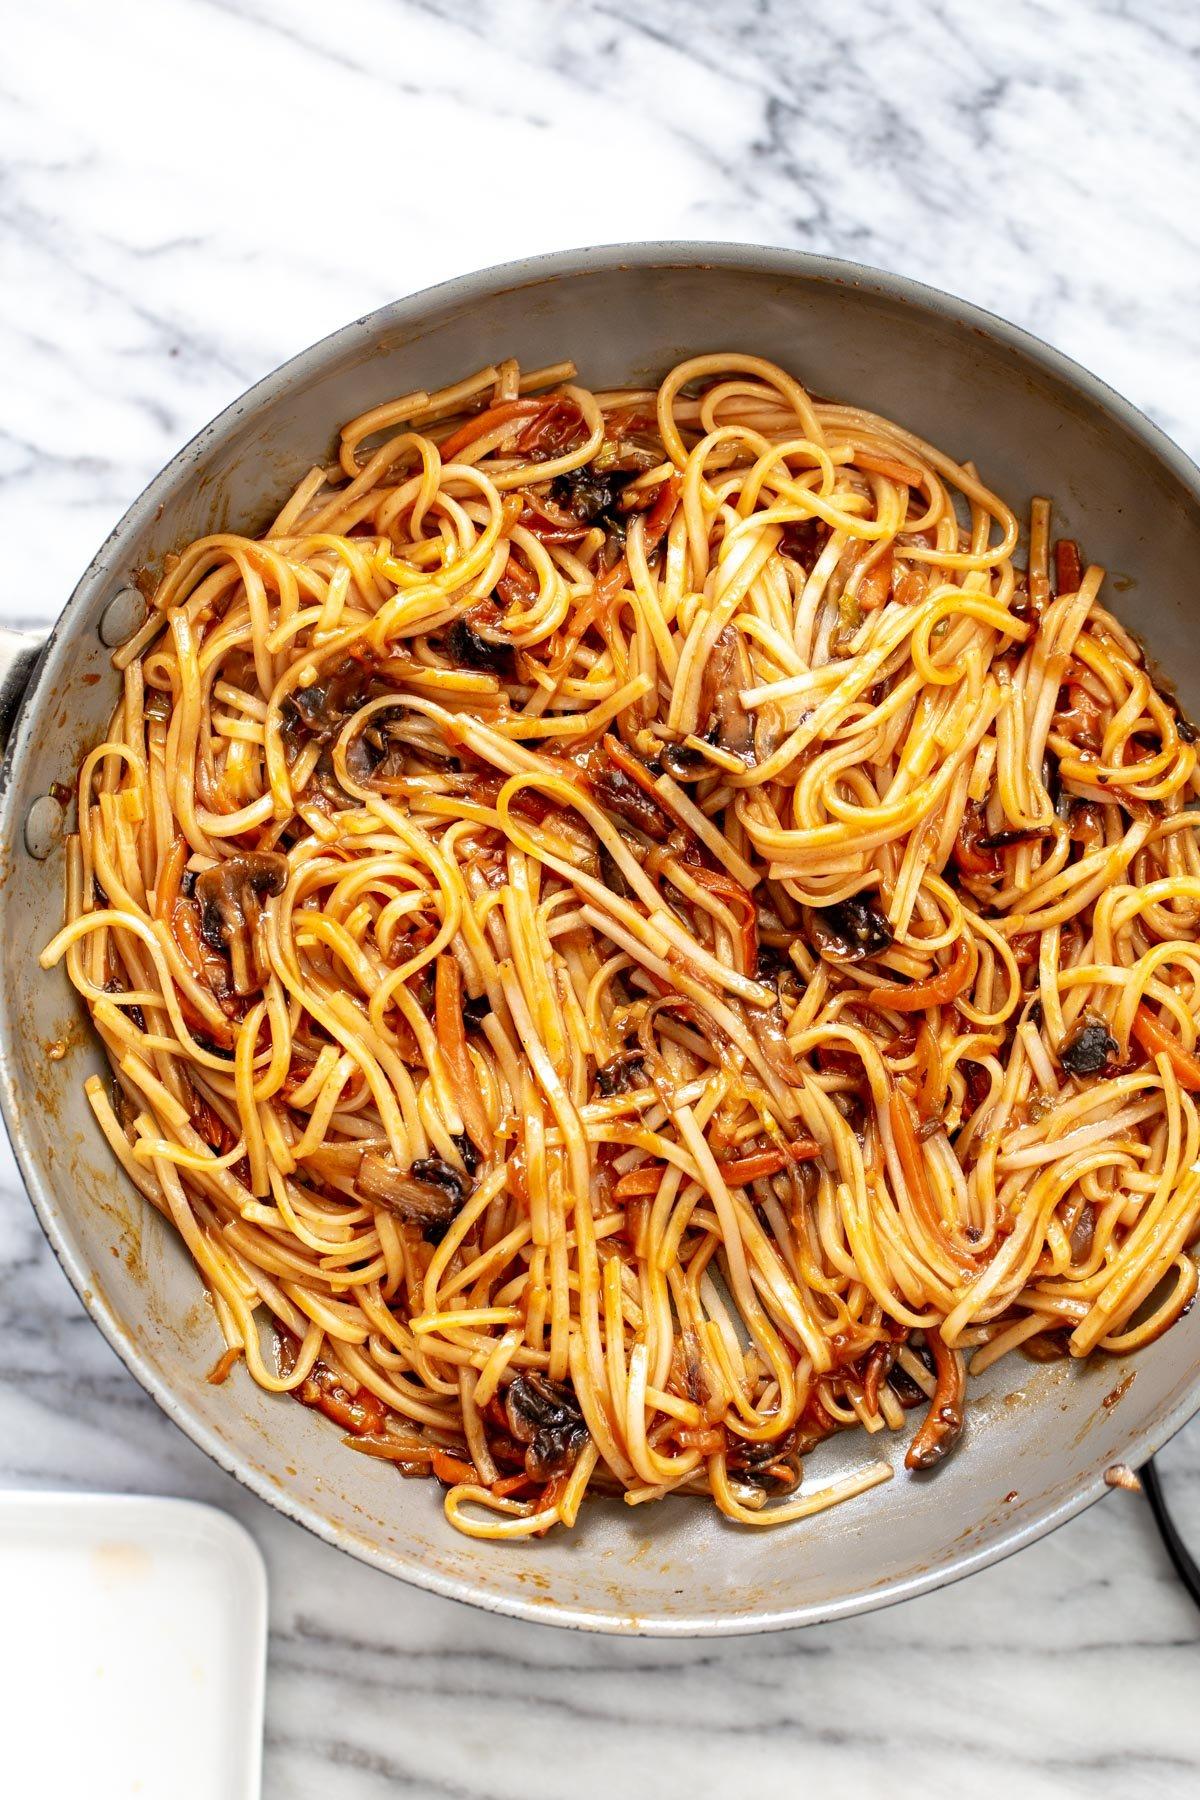 Vegan Korean gochujang noodles in a saucepan